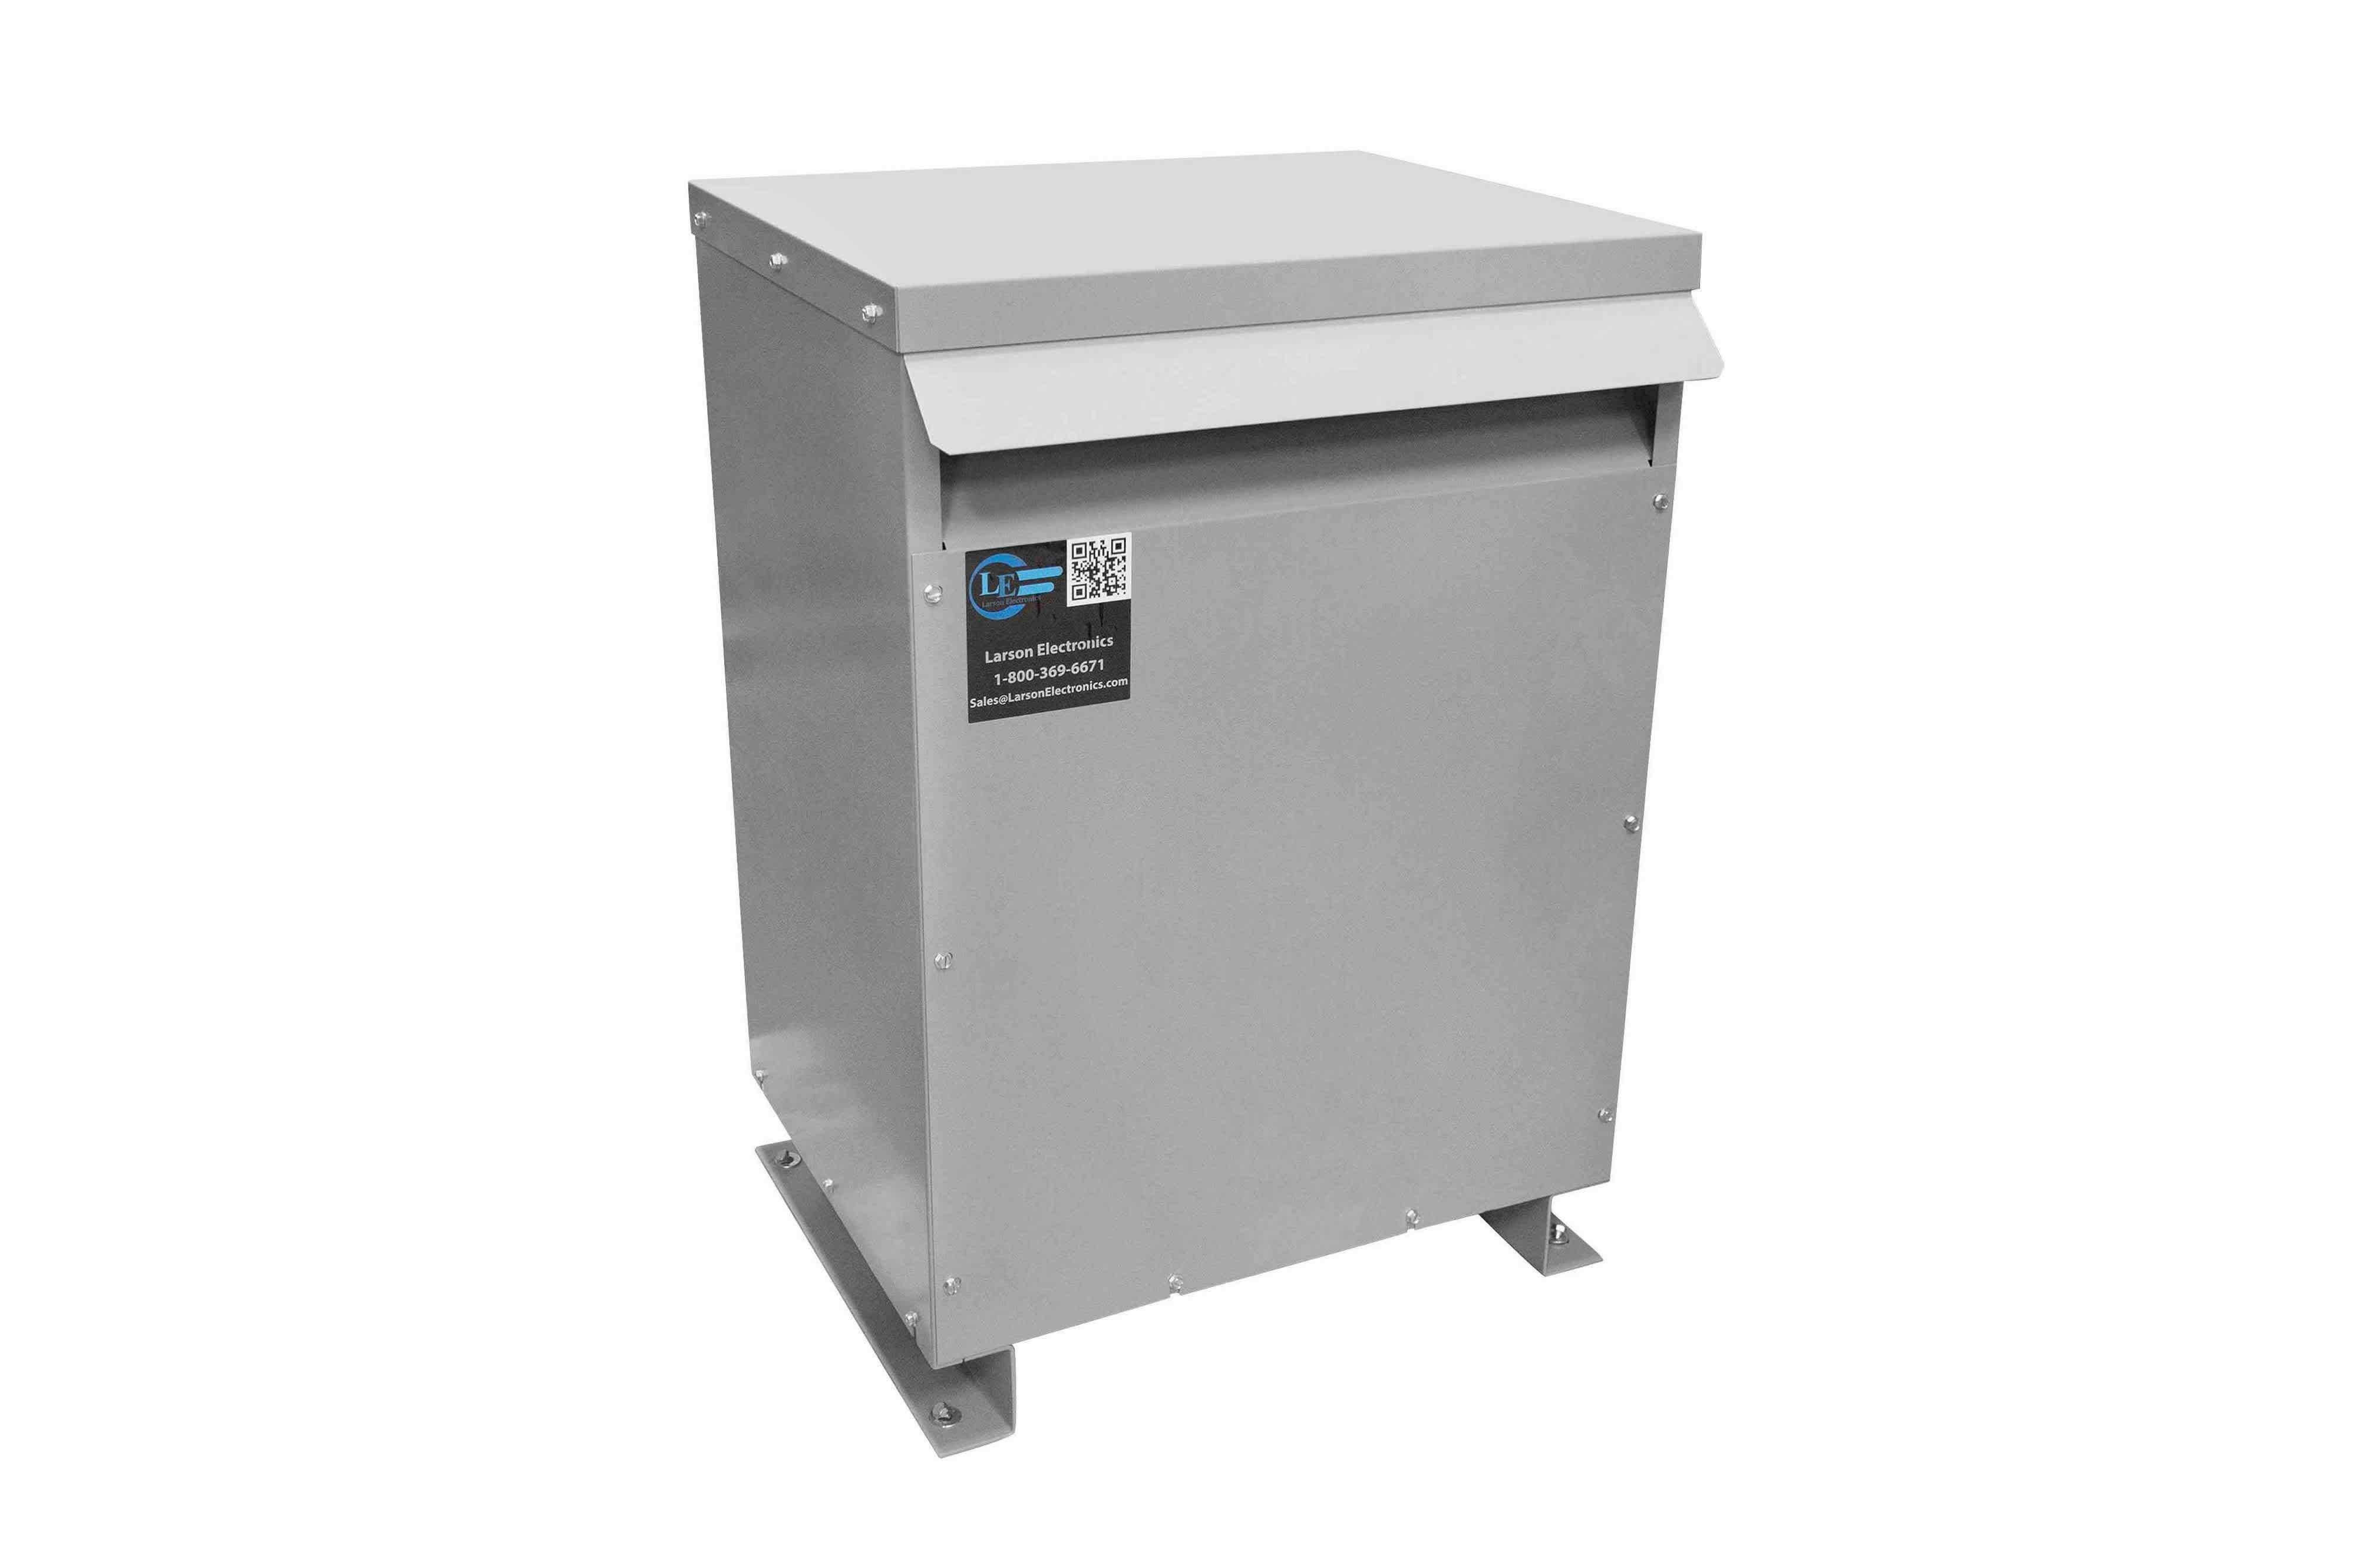 28 kVA 3PH Isolation Transformer, 208V Wye Primary, 208V Delta Secondary, N3R, Ventilated, 60 Hz